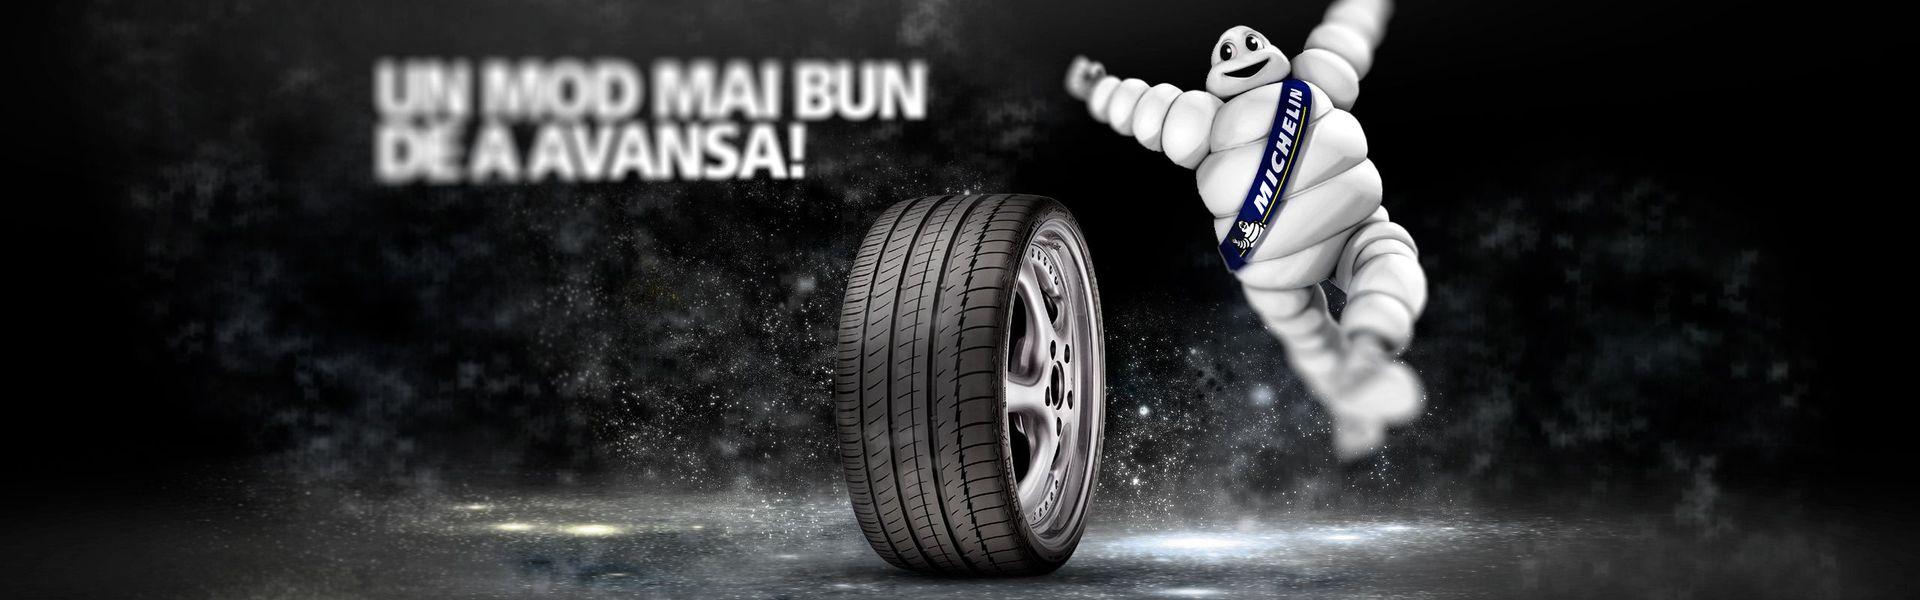 Michelin. Движение к совершенству